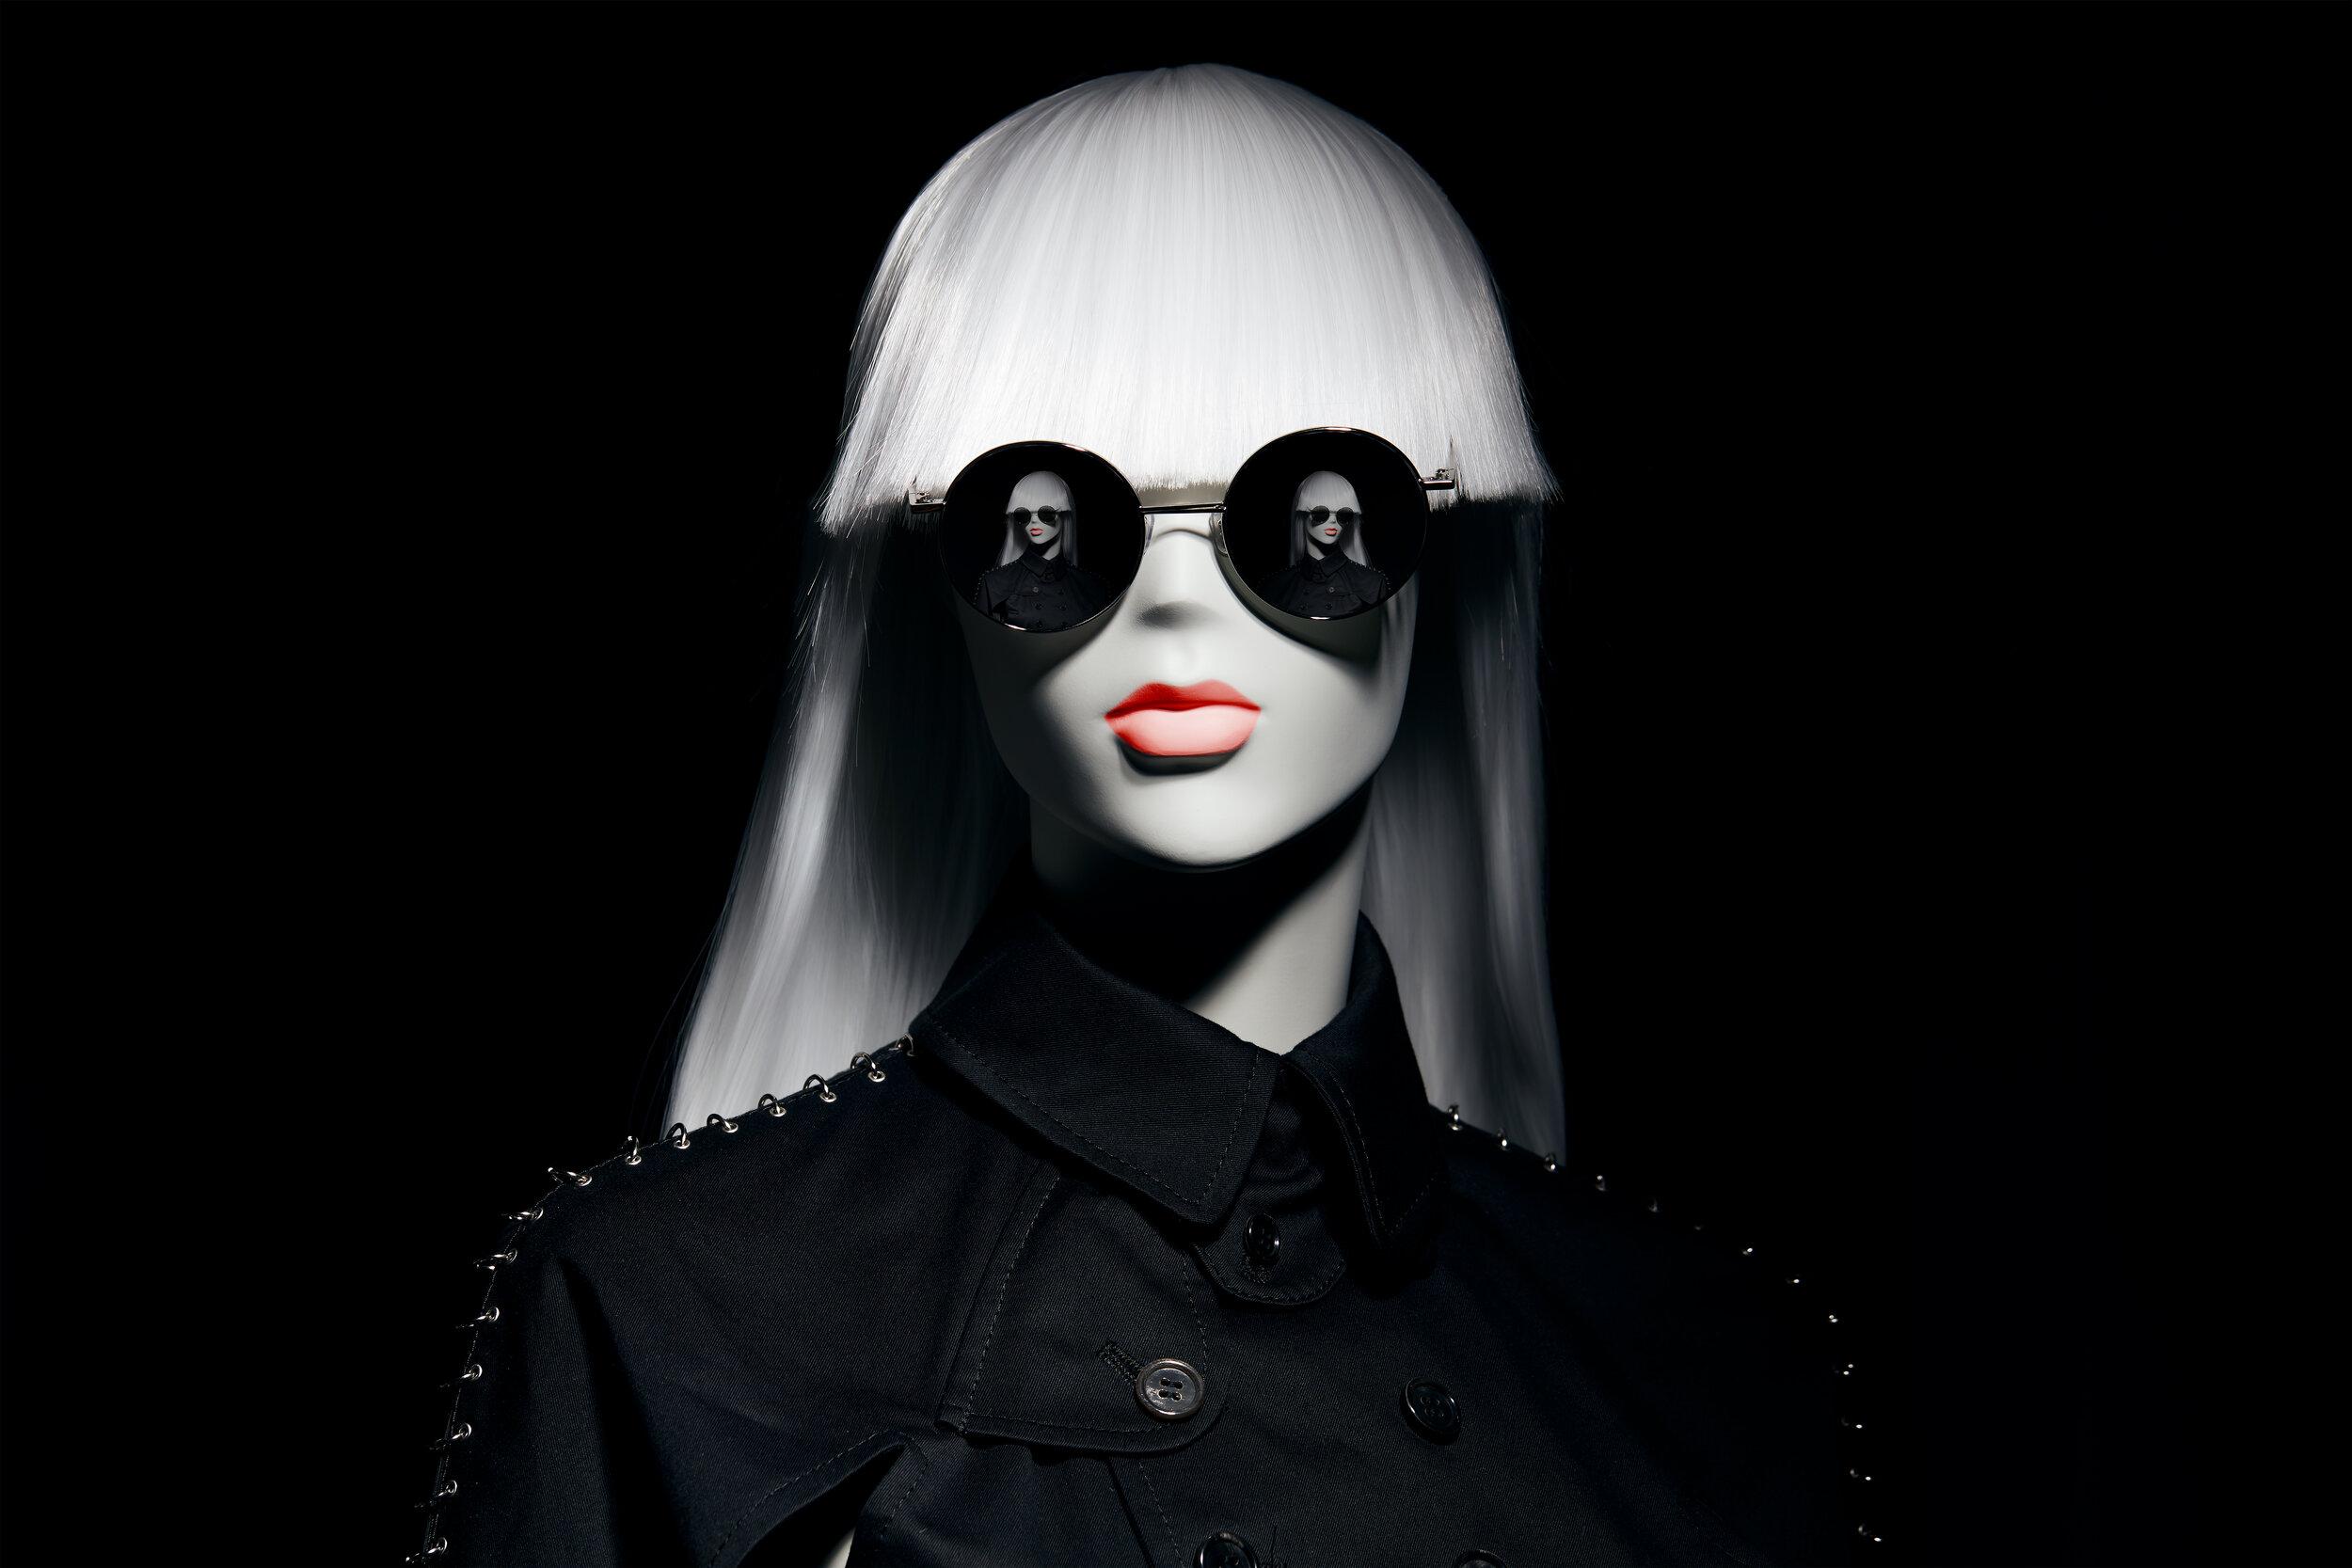 Io wearing Gentle Monster and Comme des Garçons Noir Kei Ninomiya - London, 2019